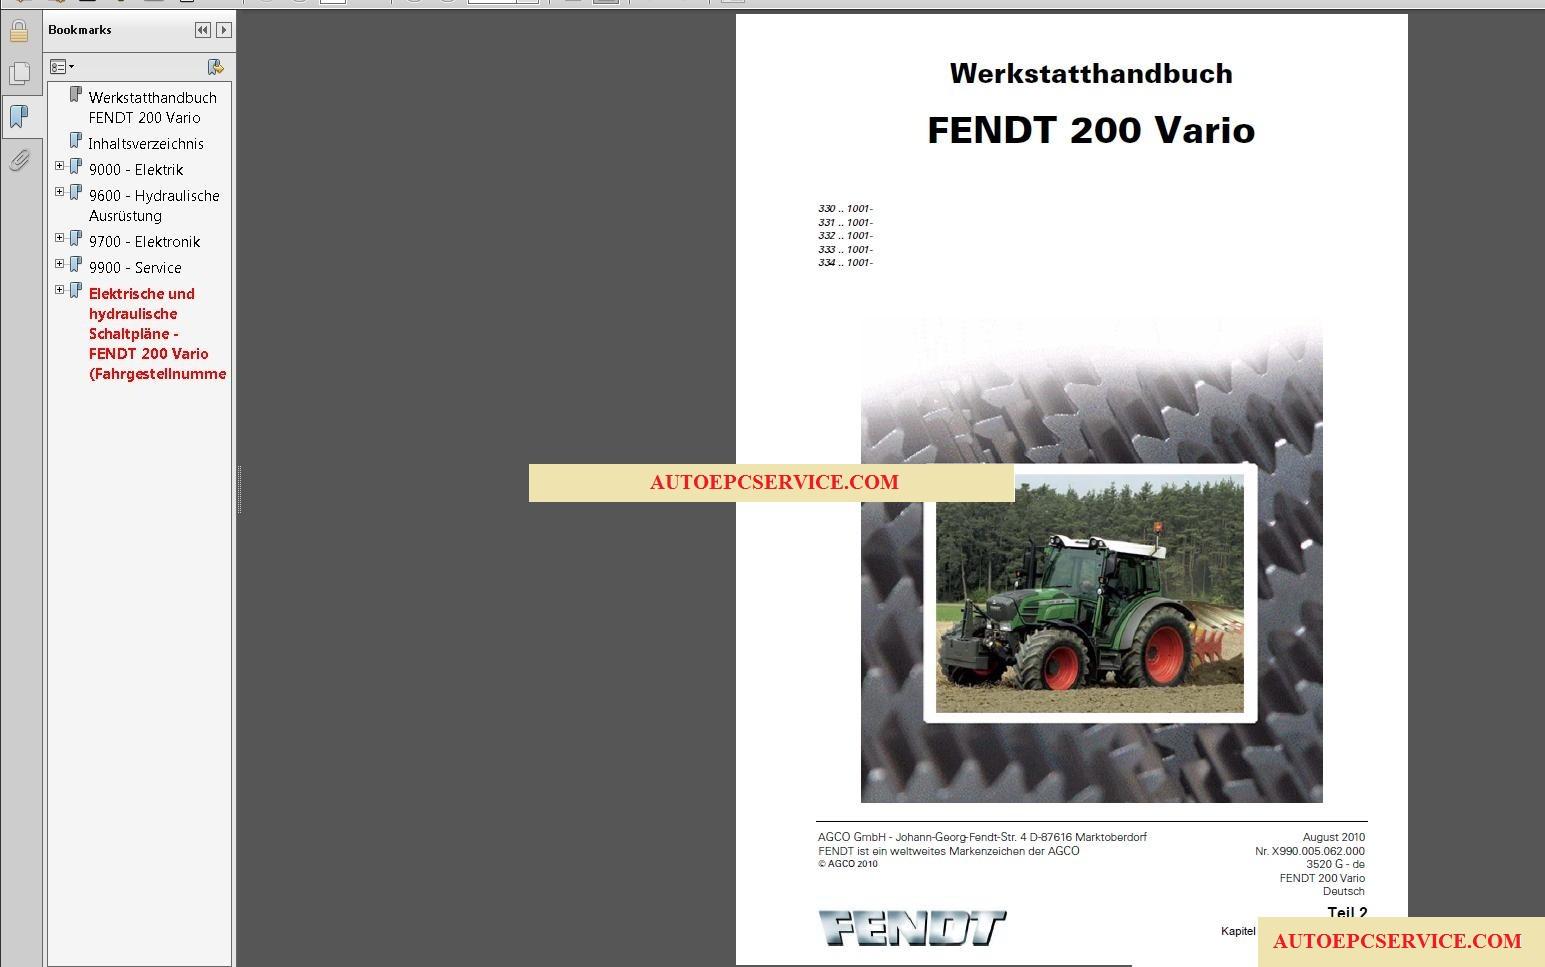 autoepcserviceheavyequipment: FENDT TRACTORS Operator Maintenance